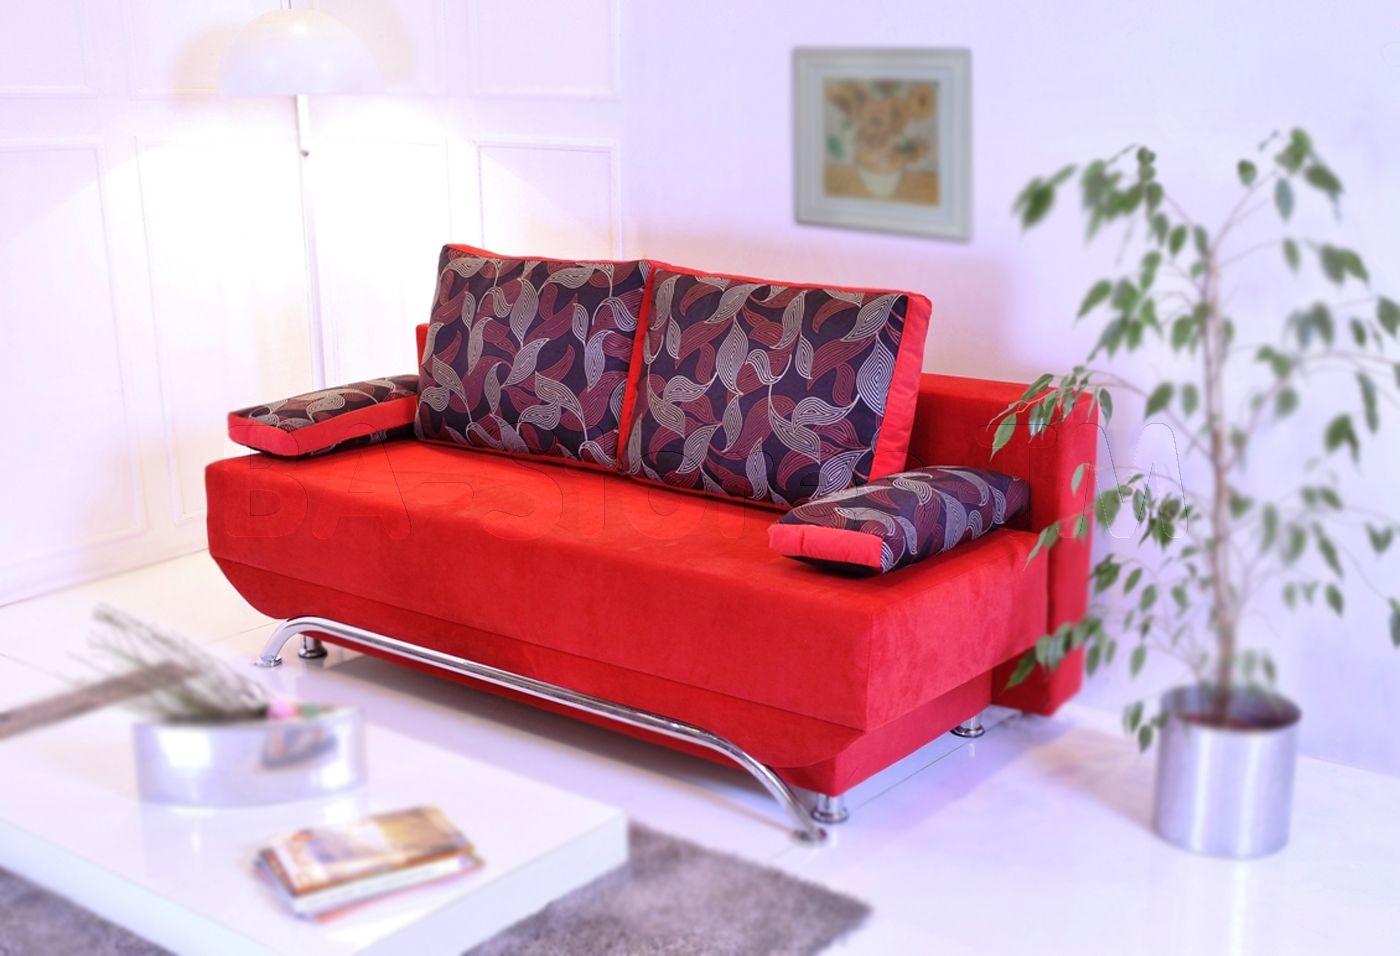 Rain Furniture Concorde Red Sofa Bed Beds Kt 24 Sb 0 Rh Pinterest Com